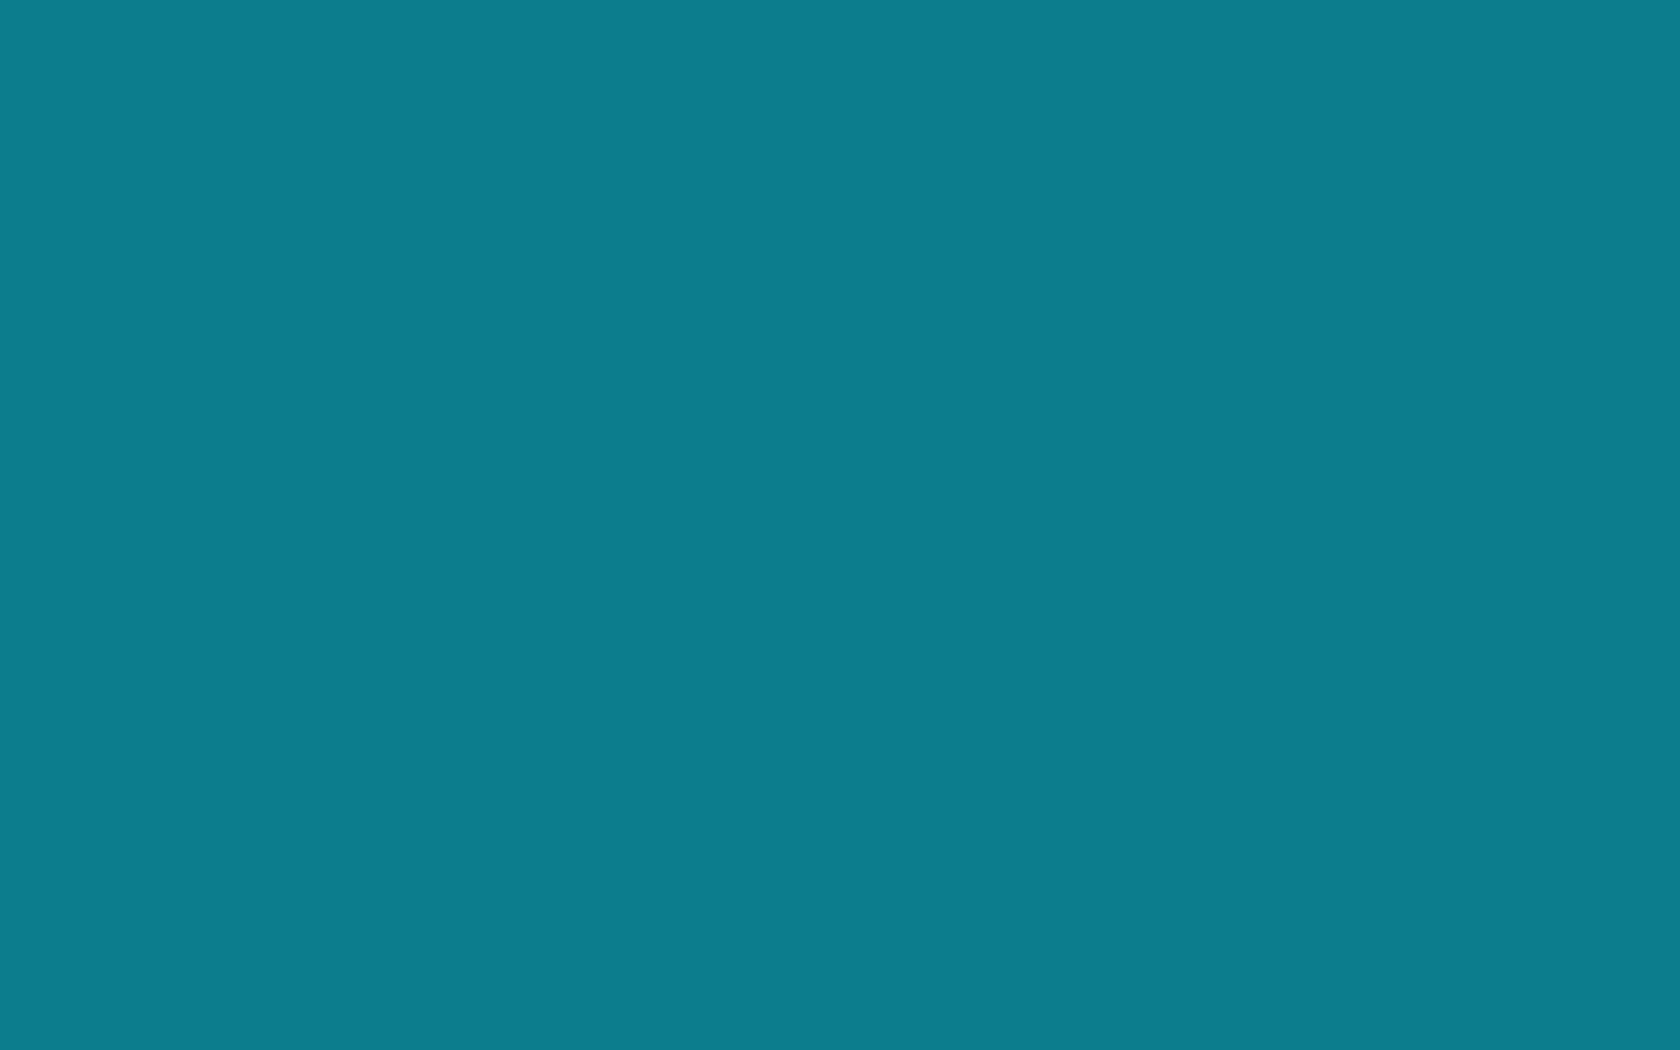 1680x1050 Metallic Seaweed Solid Color Background